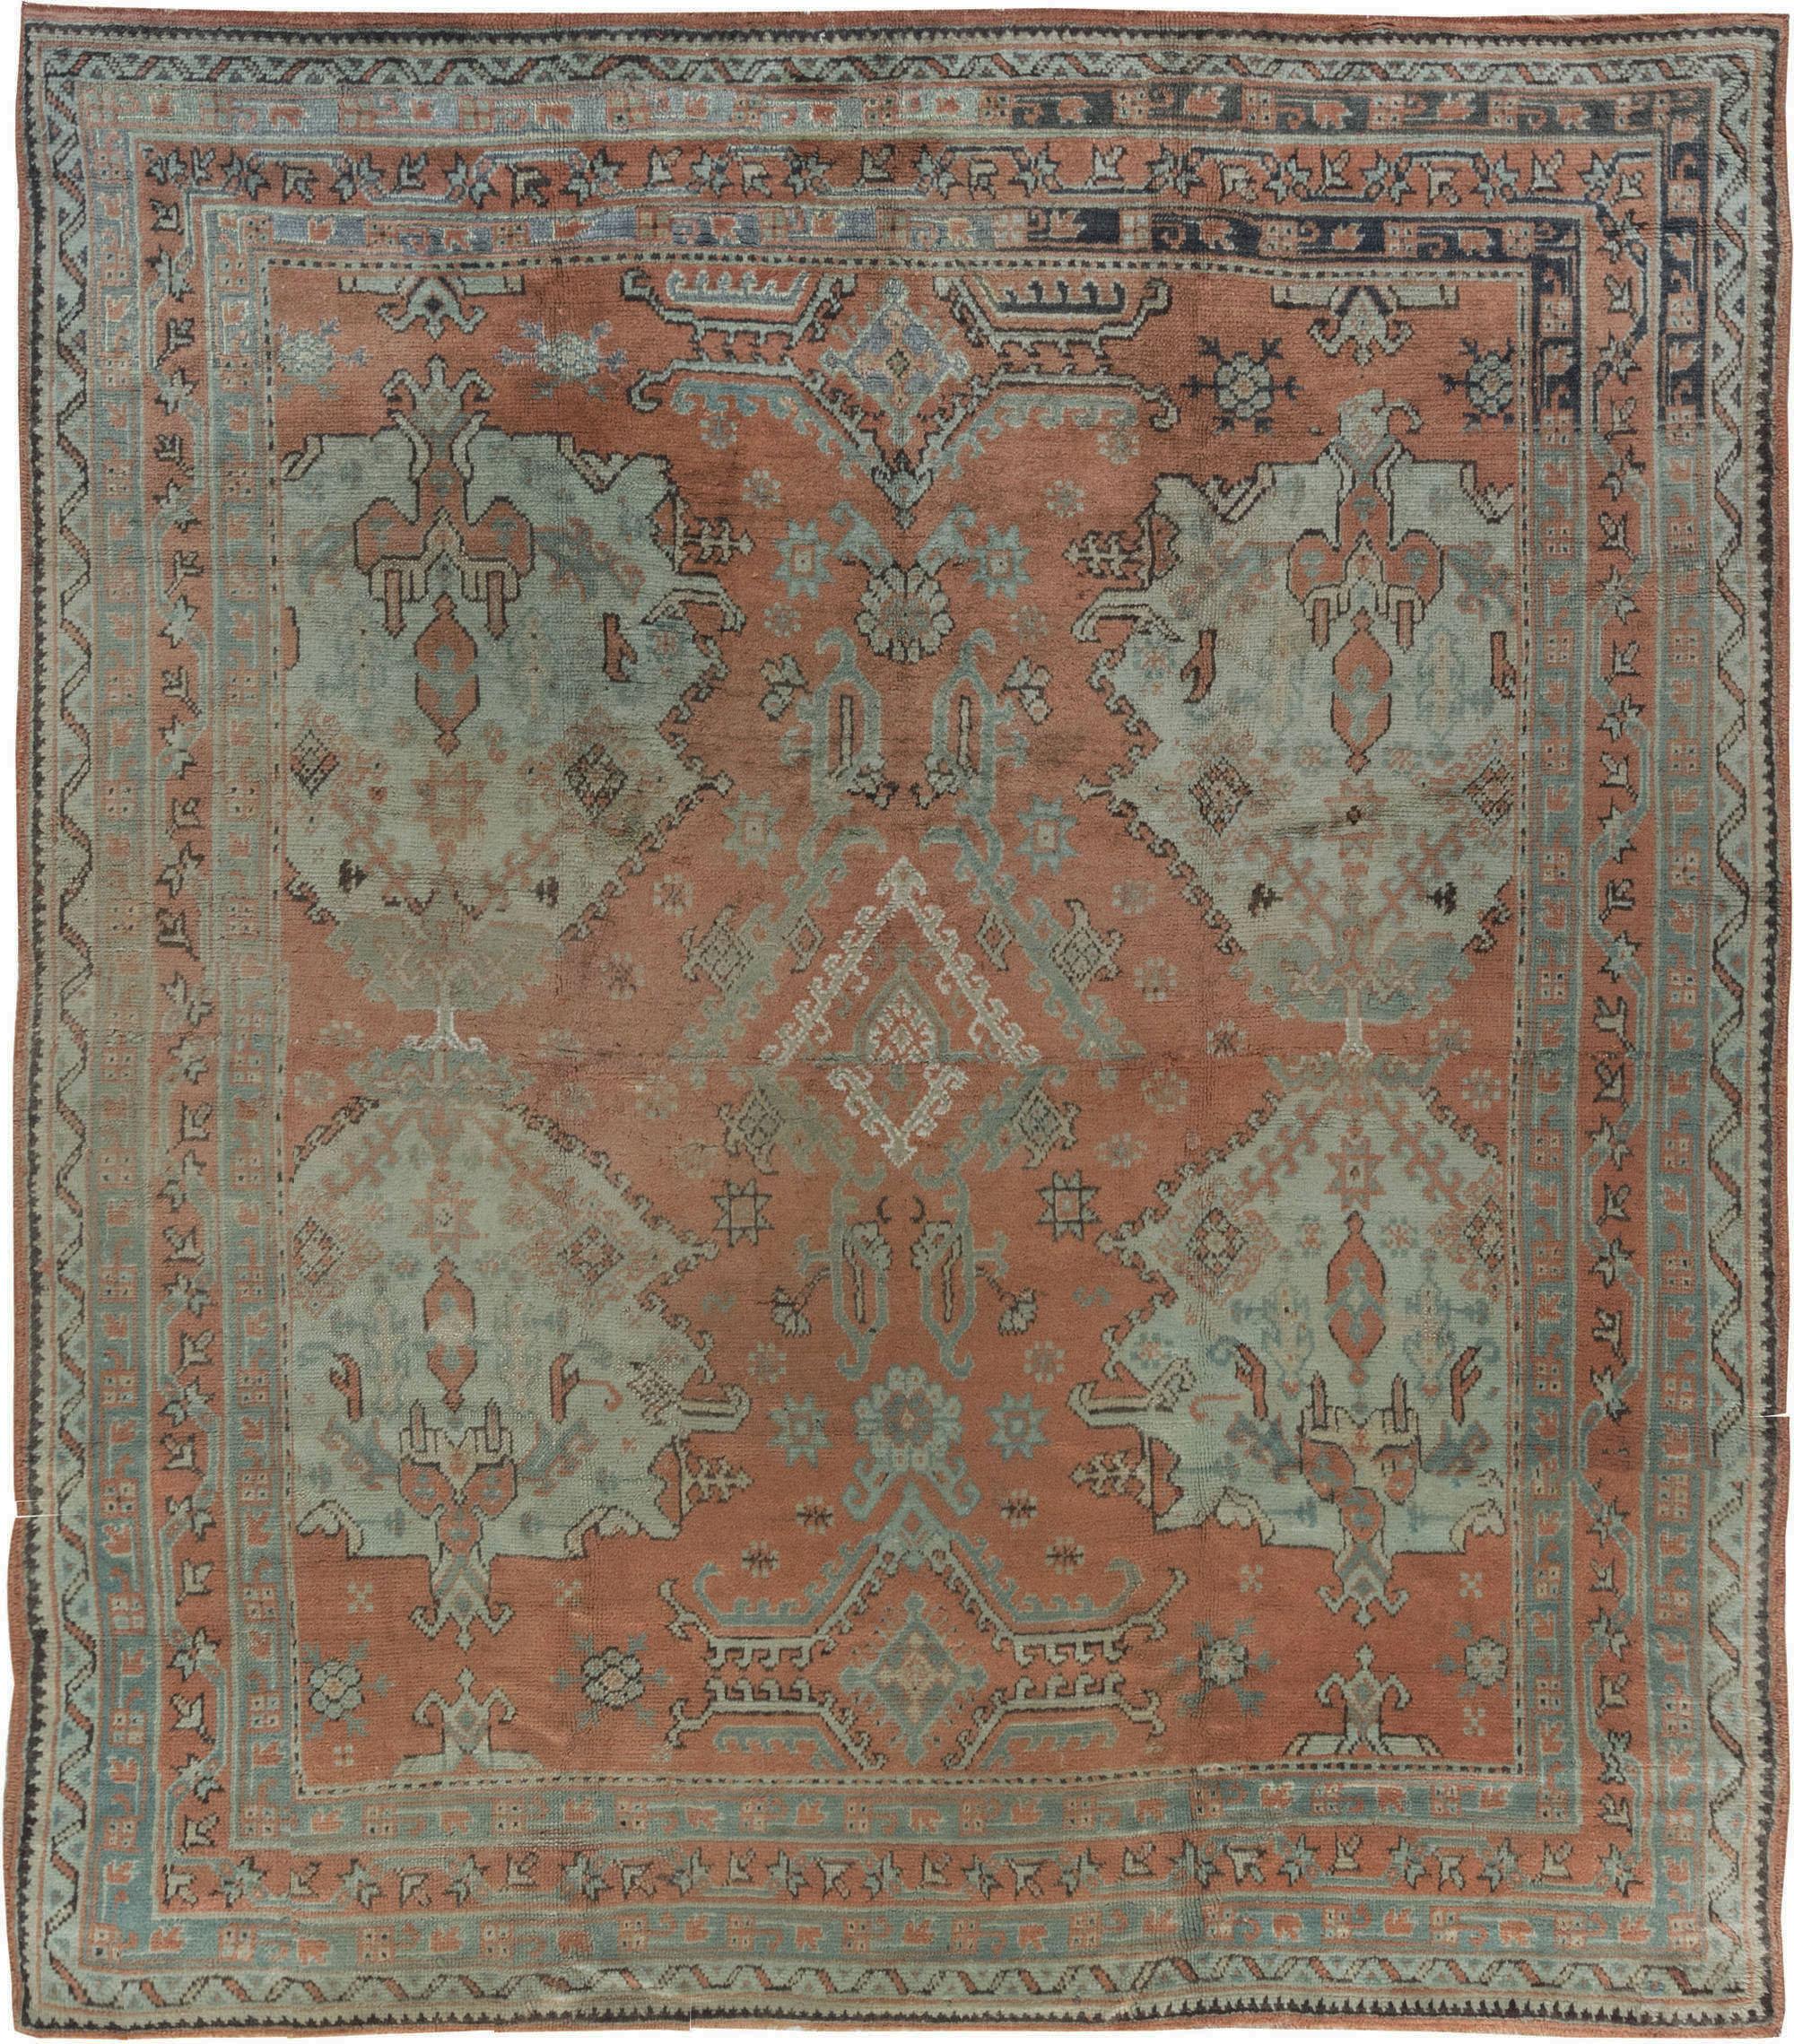 Antique Vintage Turkish Rugs: Antique Turkish Oushak BB6897 By Doris Leslie Blau